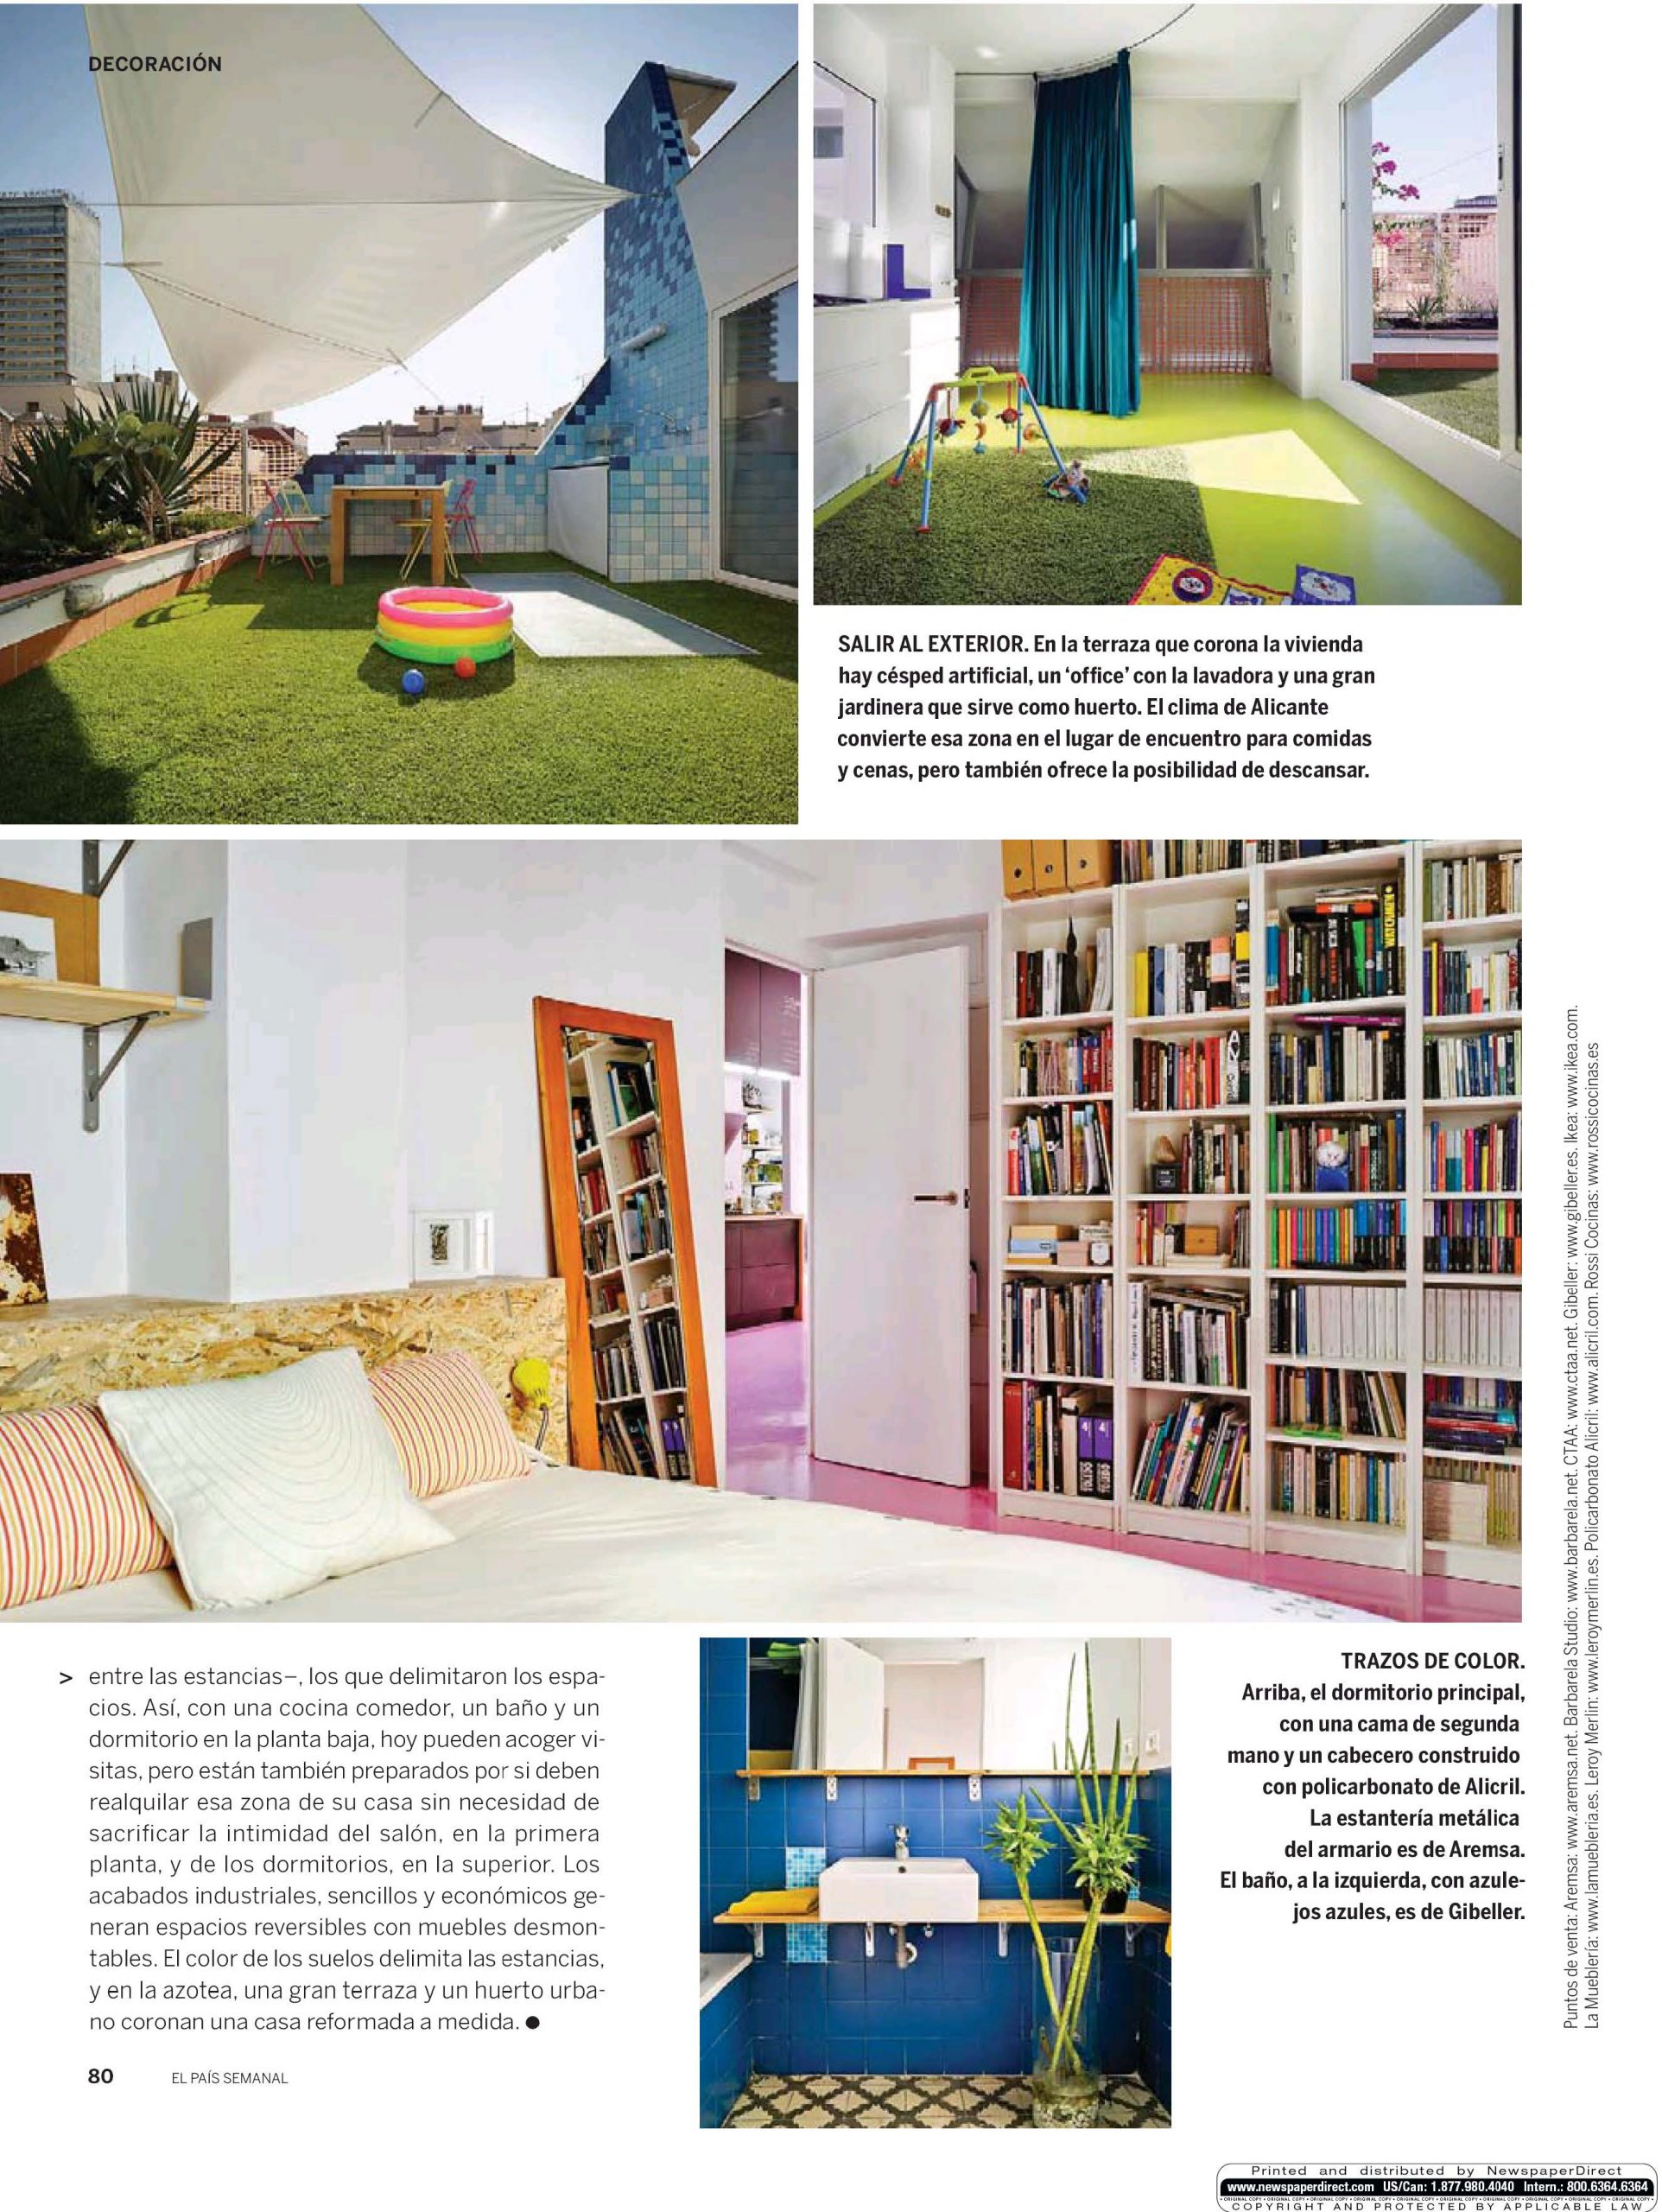 Casa lulú EL PAIS SEMANAL